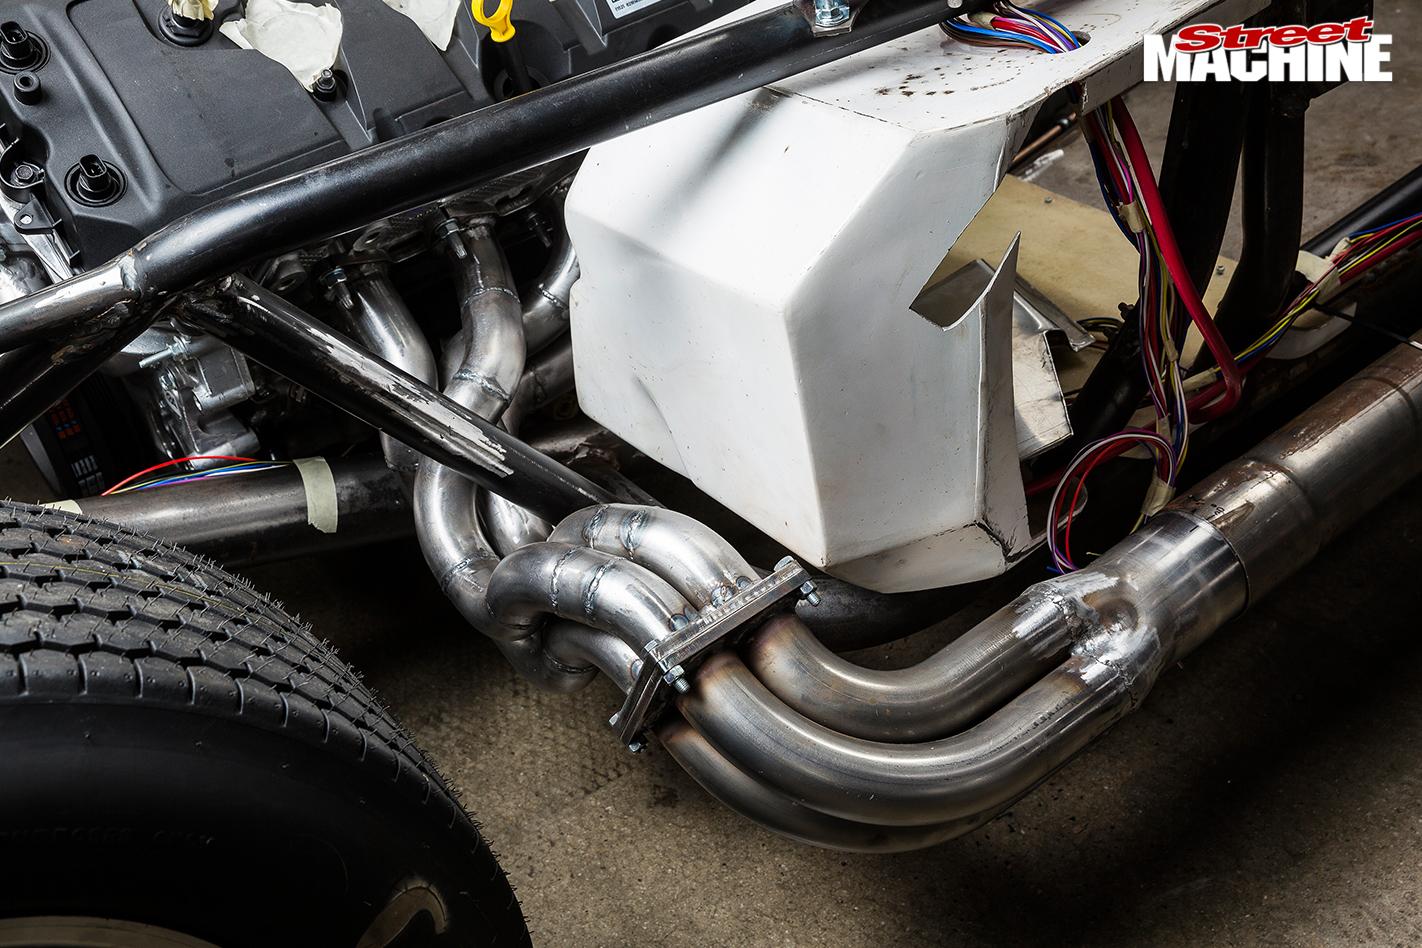 Sidchrome -cobra -exhausts